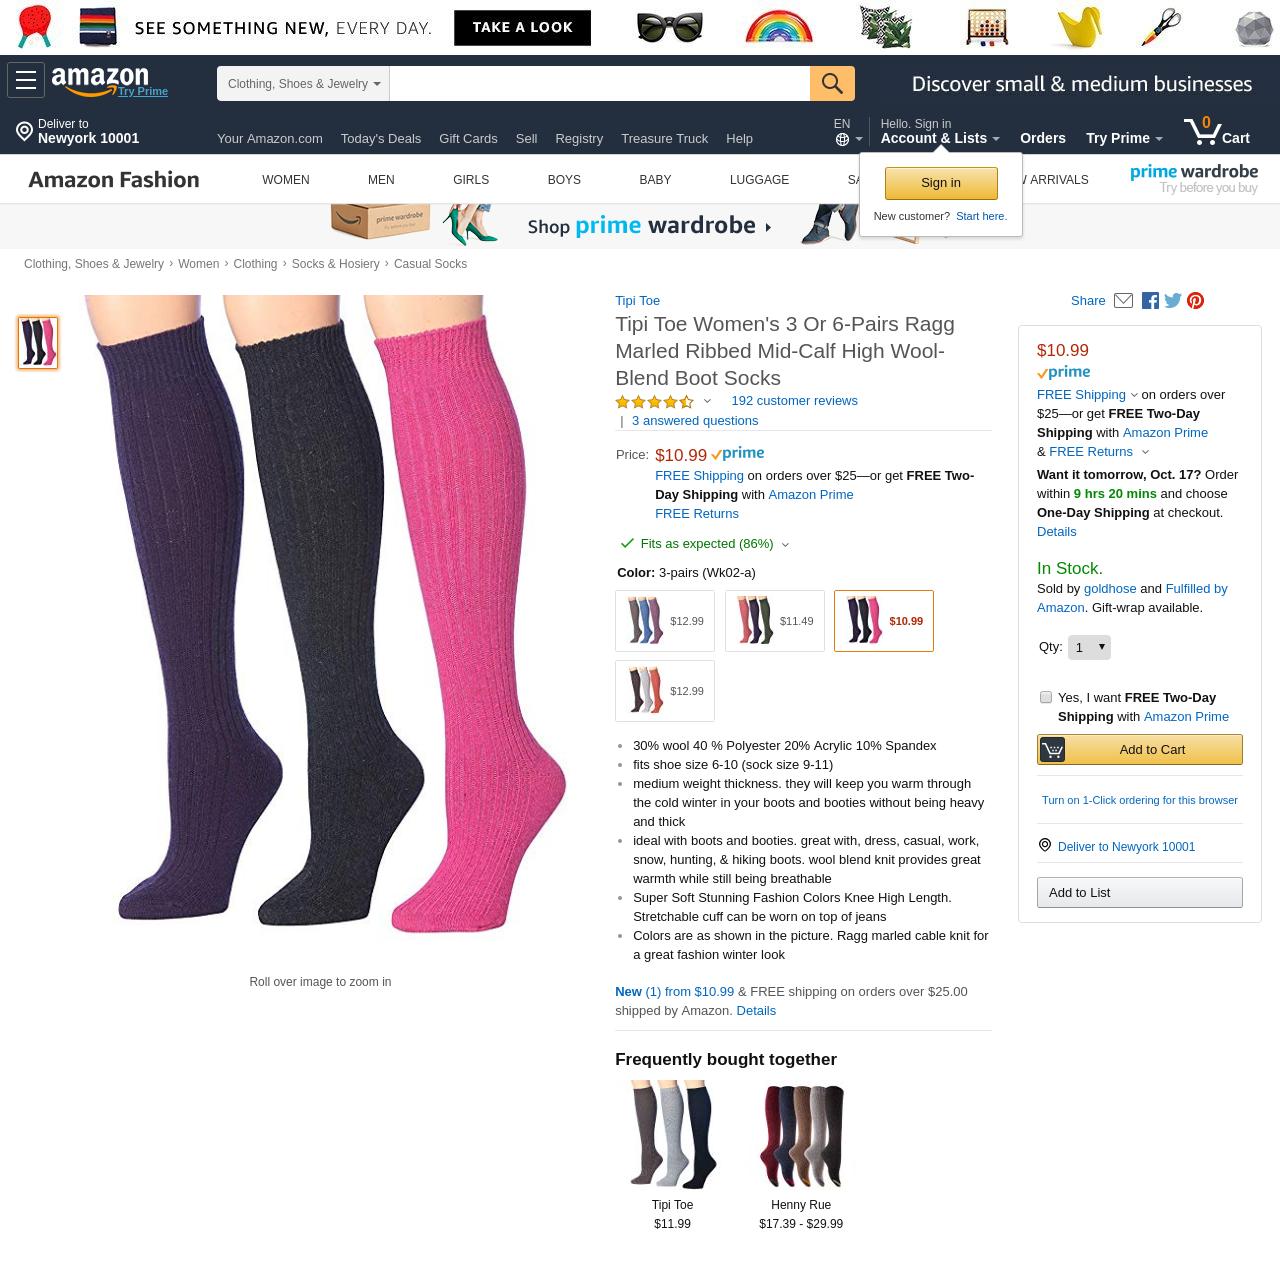 3f53cdfe3b5 Are.na   Tipi Toe Women s 3-Pairs Ragg Marled Argyle Knee High Wool-Blend  Boot Socks